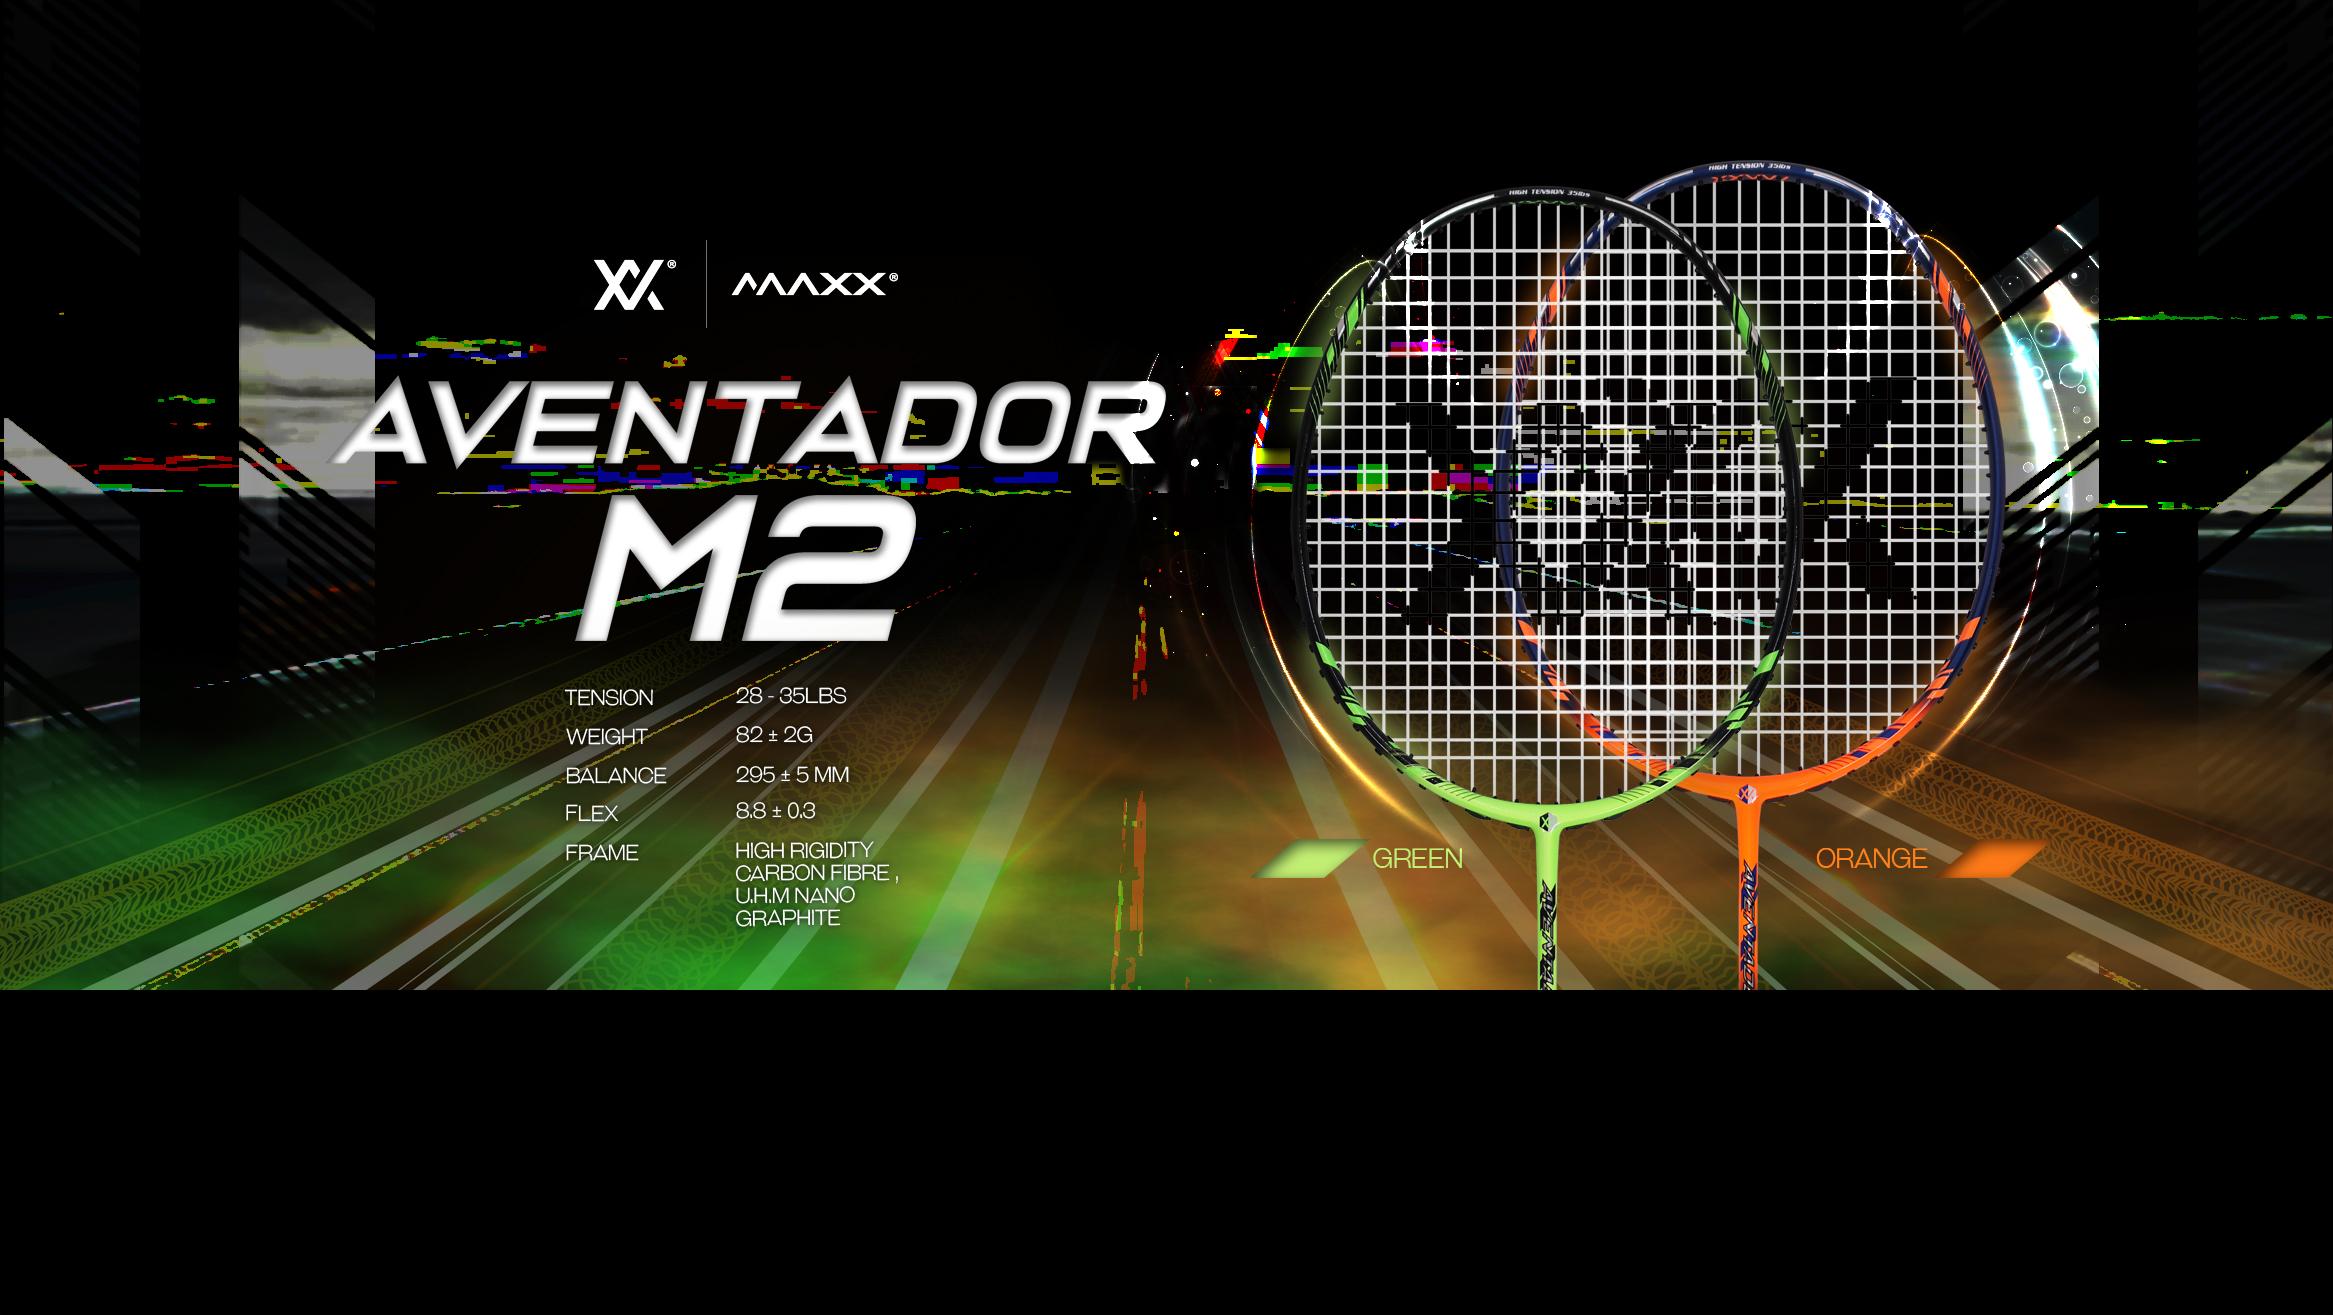 maxx-aventador-m2-slider